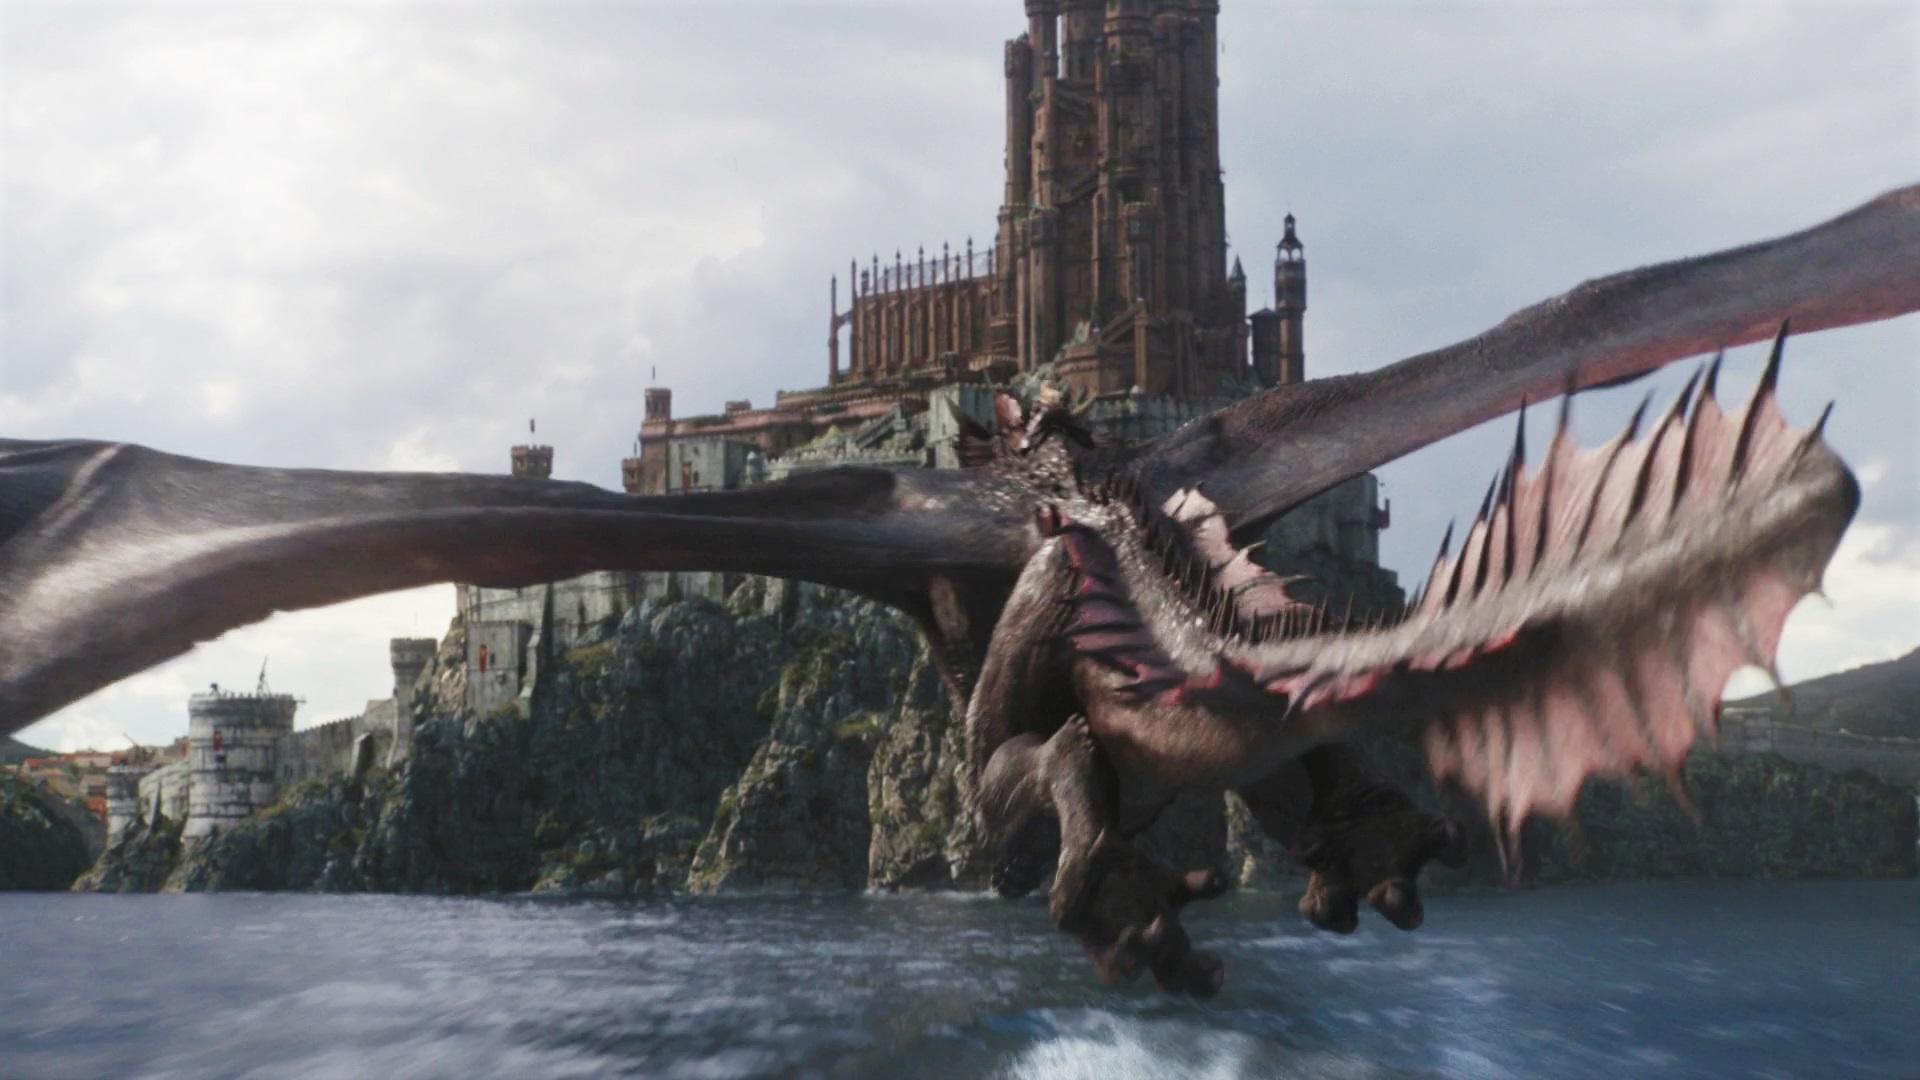 Daenerys Dany Targaryen King's Landing Red Keep Drogon Season 8 805 The Bells